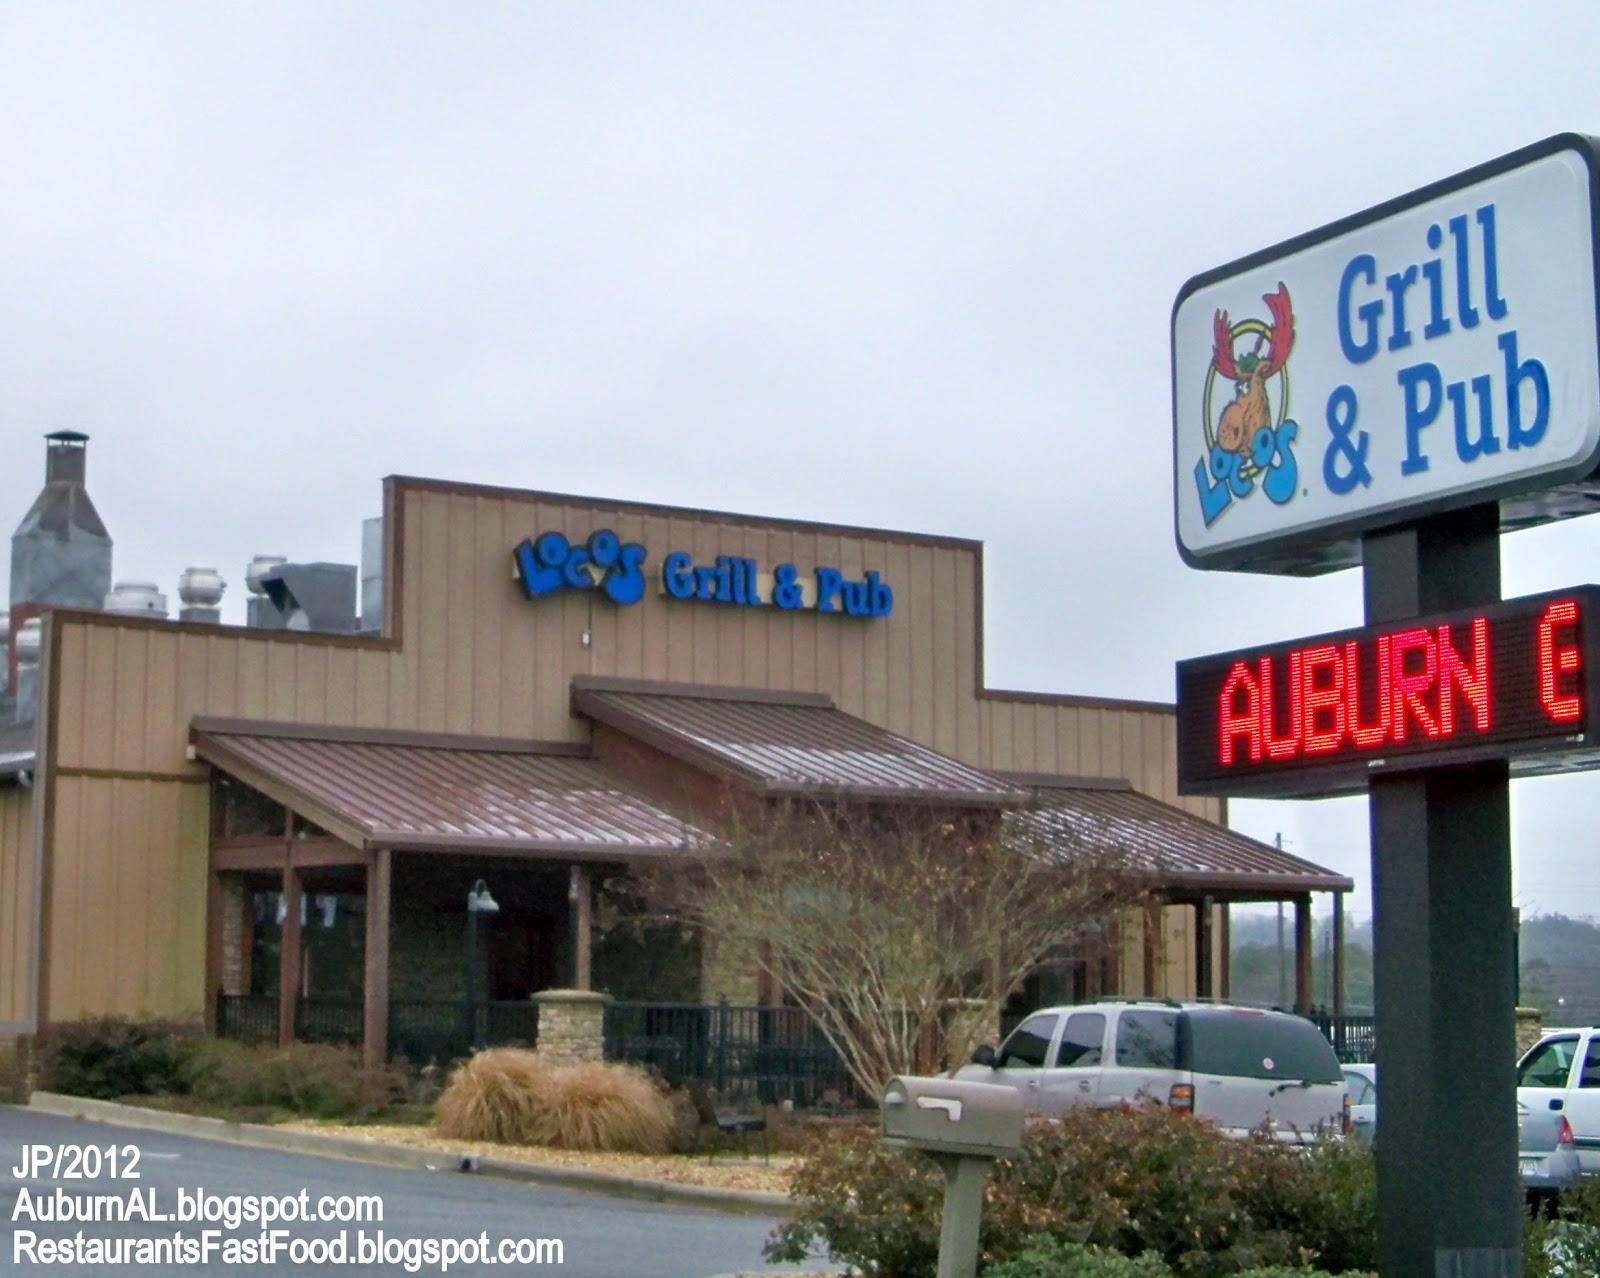 Alabama lee county salem - Loco S Grill Auburn Alabama S College St Locos Grill Pub Restaurant Auburn Al Lee County 1120 S College St Auburn Al 36832